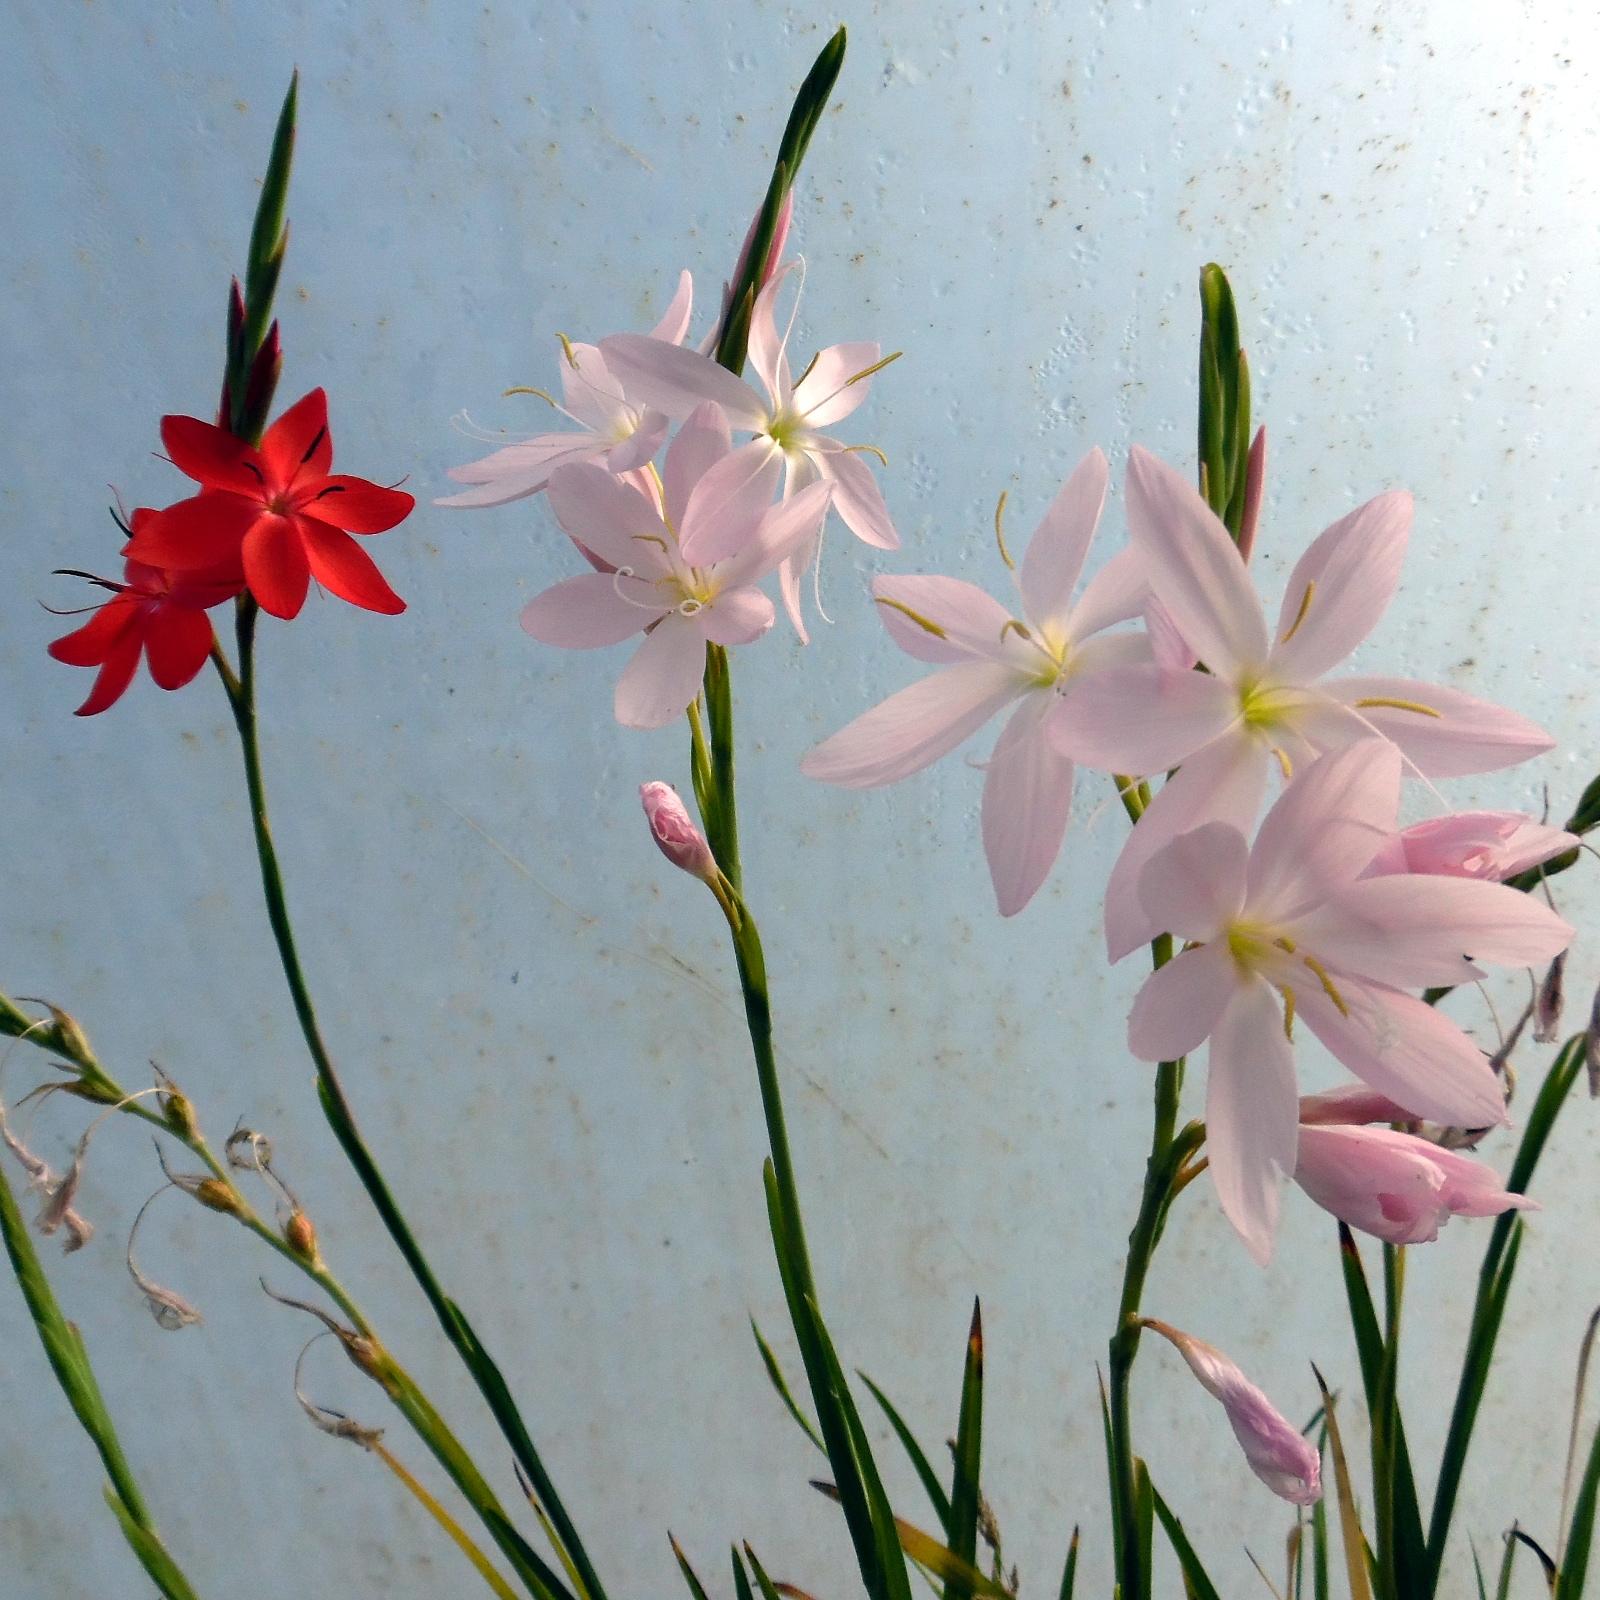 Schizostylis, Kaffir Lily, Mixed Colours